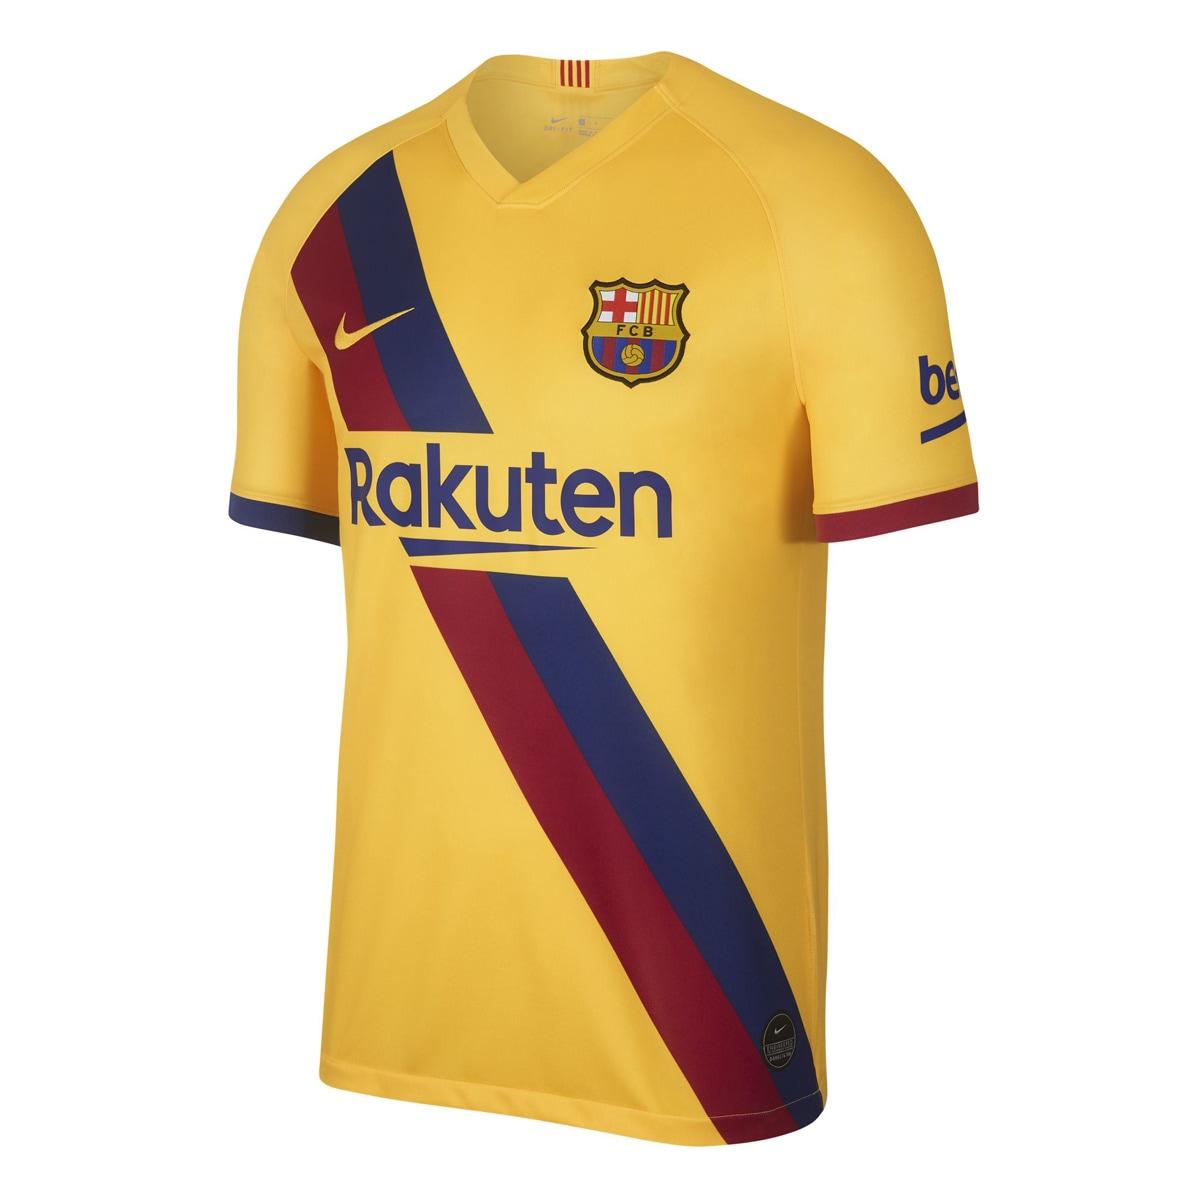 Maillot homme extérieur FC Barcelone 2019-2020 Breath Stadium Nike